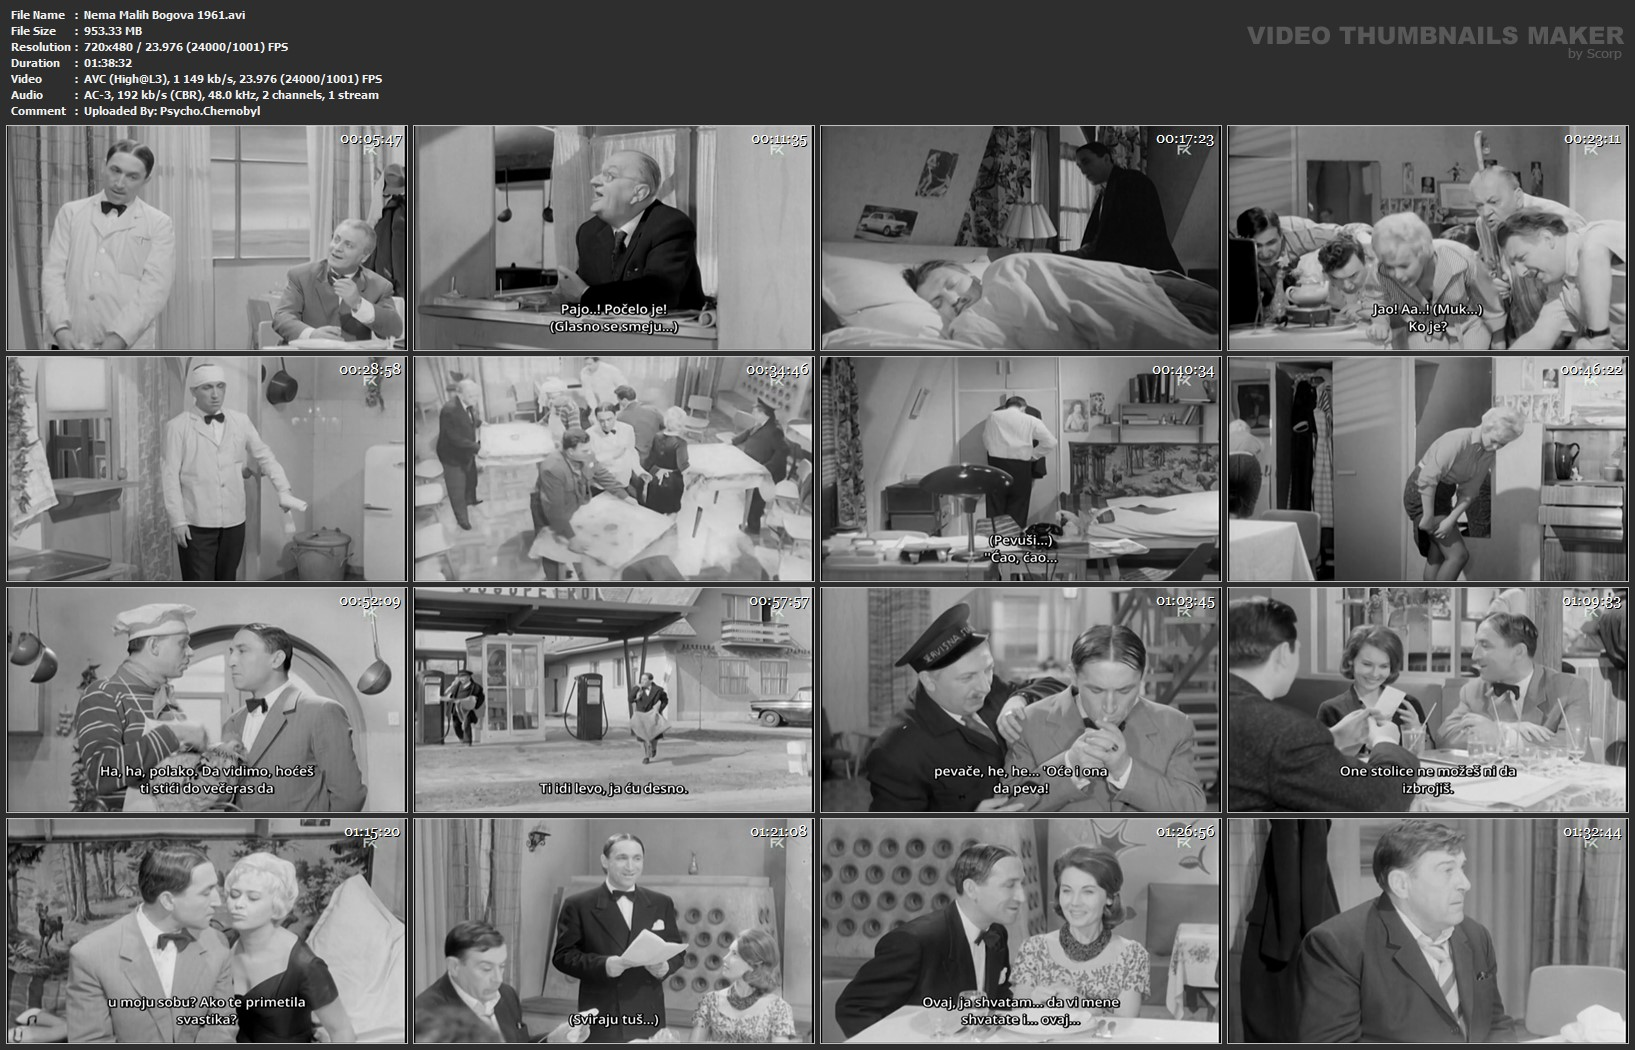 Nema-Malih-Bogova-1961-avi.jpg